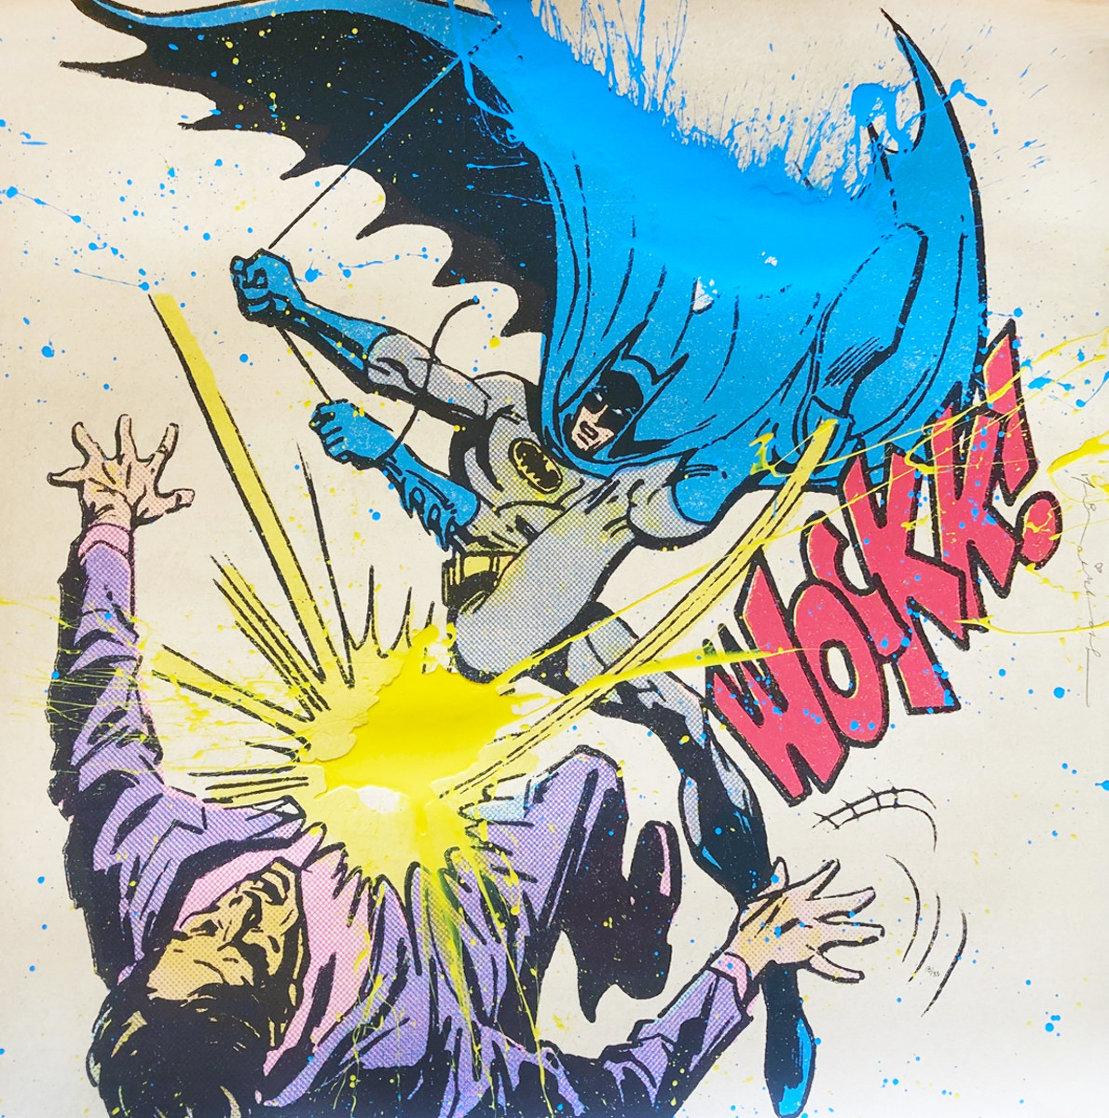 Bat Wockk 2019 Super Huge Embellished    Limited Edition Print by Mr. Brainwash